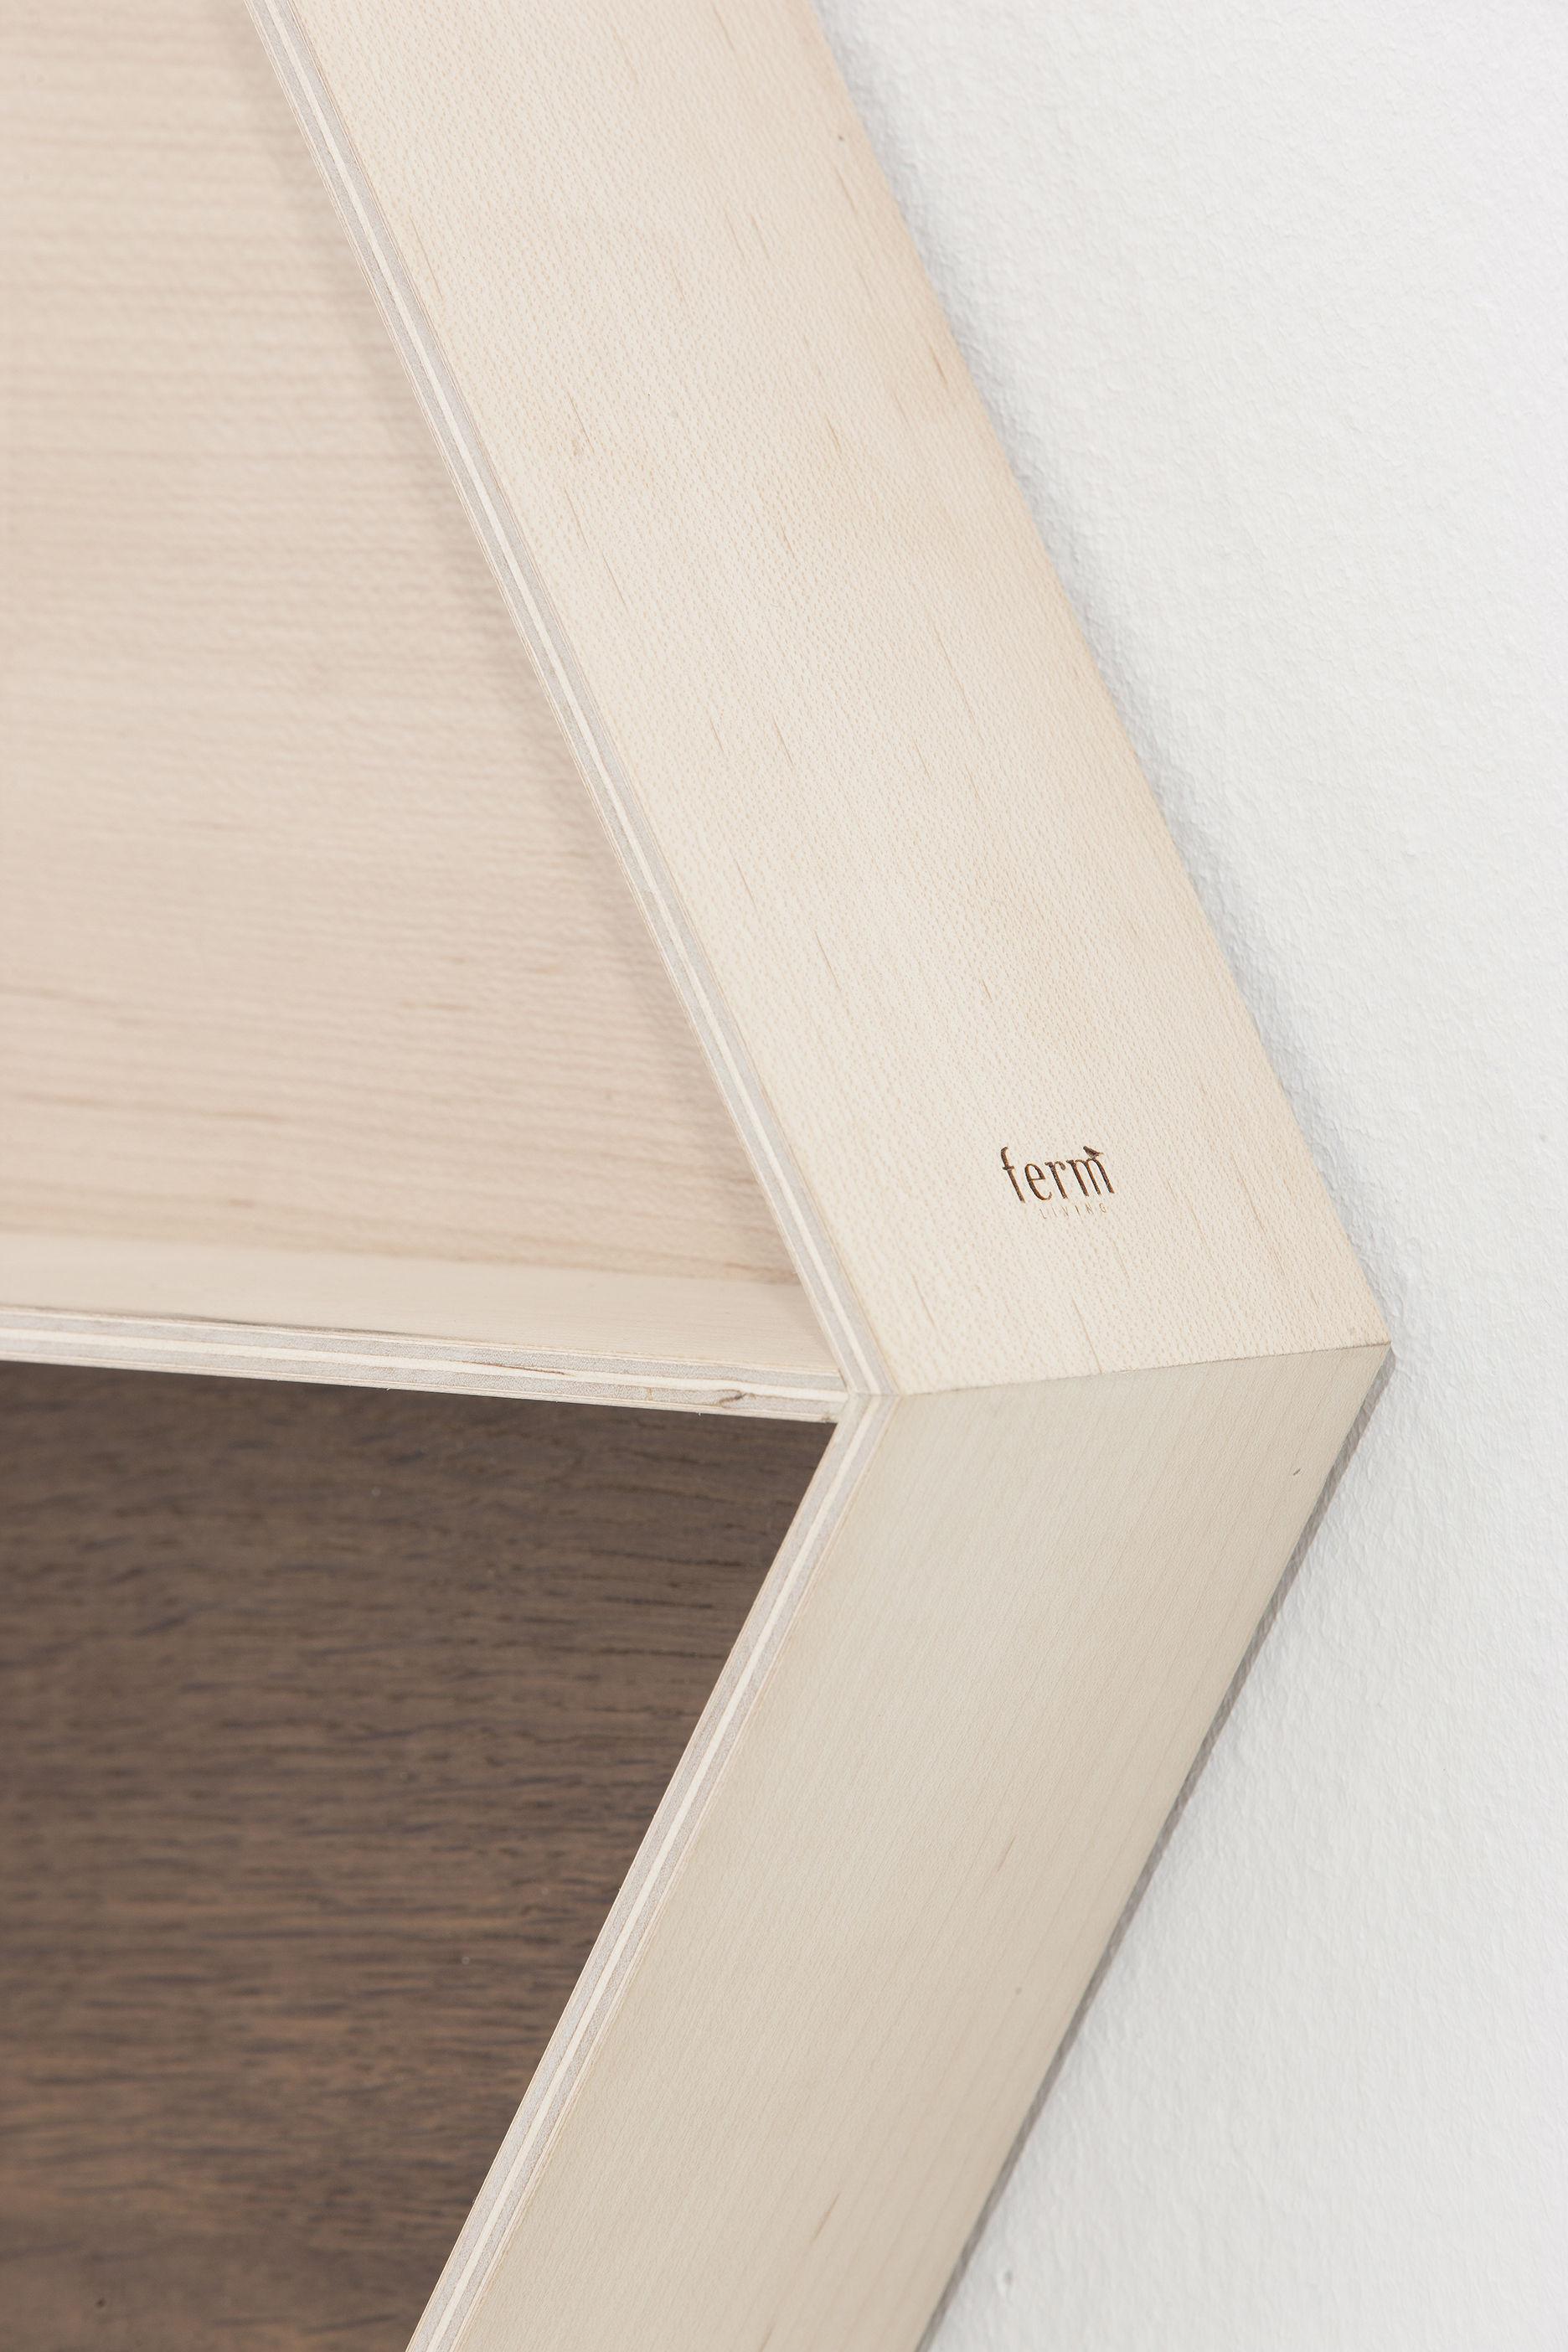 wall wonder regal 60 x 50 cm ferm living spiegel. Black Bedroom Furniture Sets. Home Design Ideas